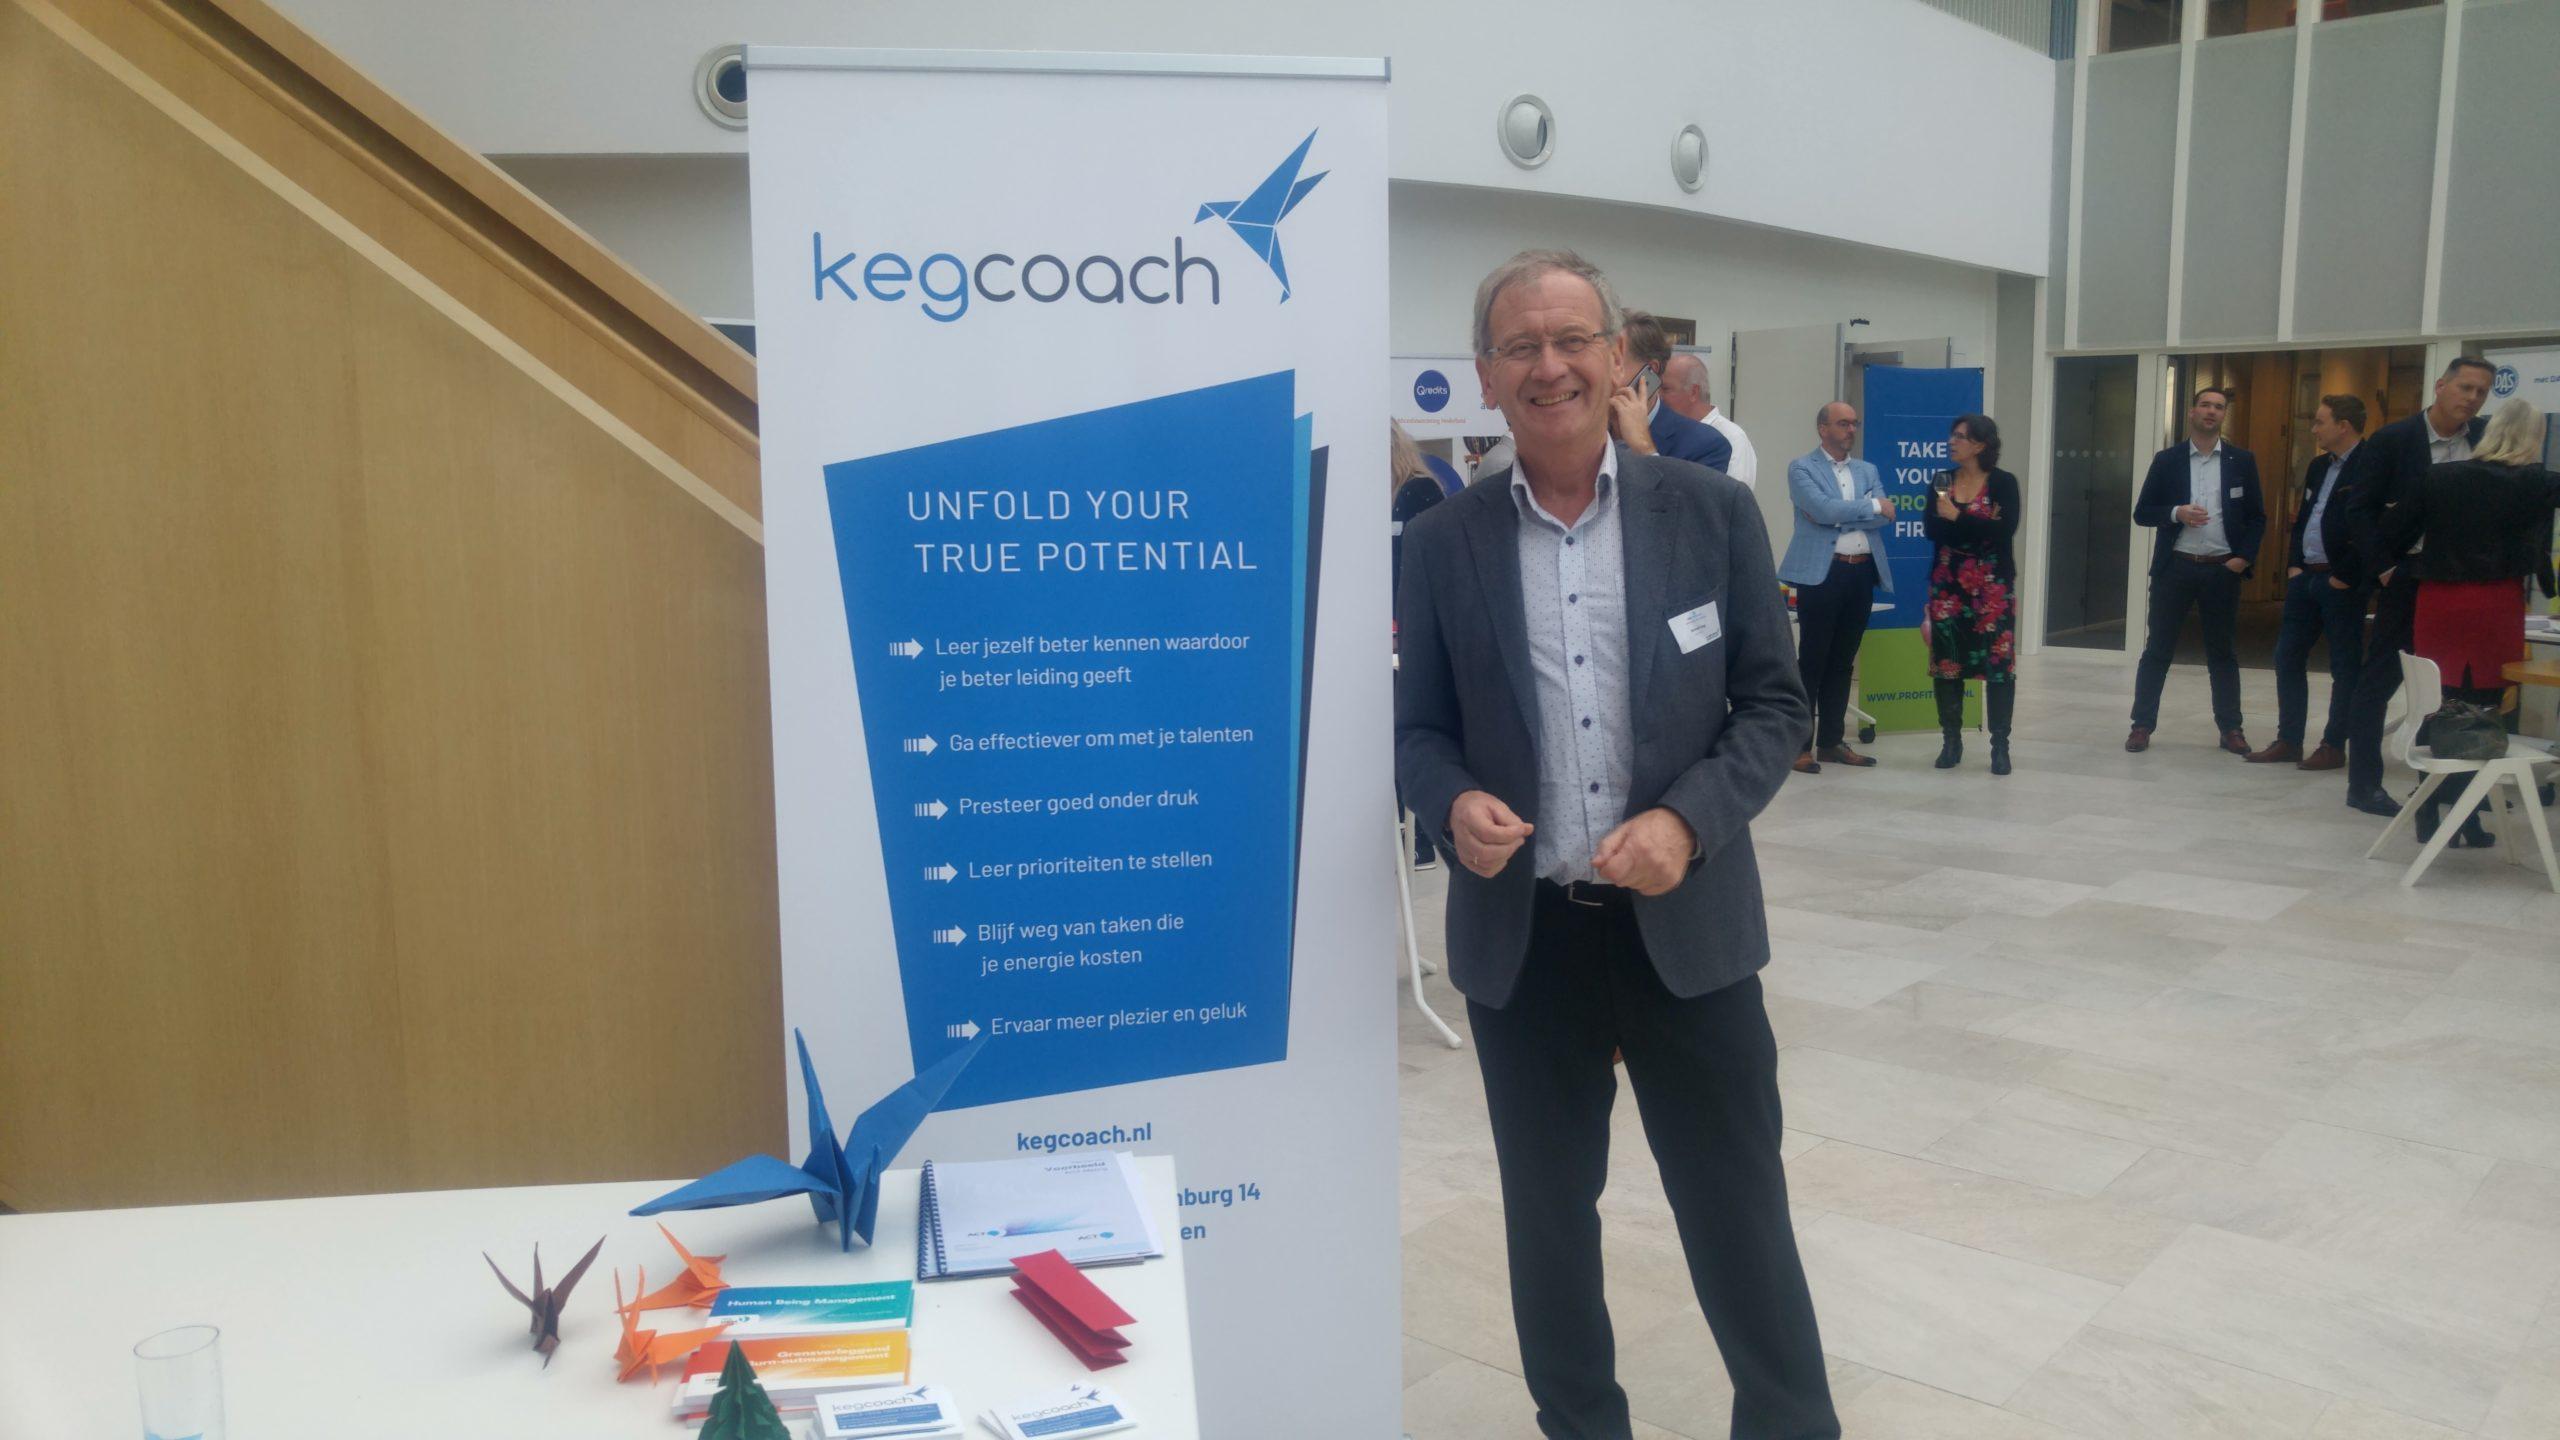 Gerard Keg van Kegcoach- de bedrijfs- en personal coach